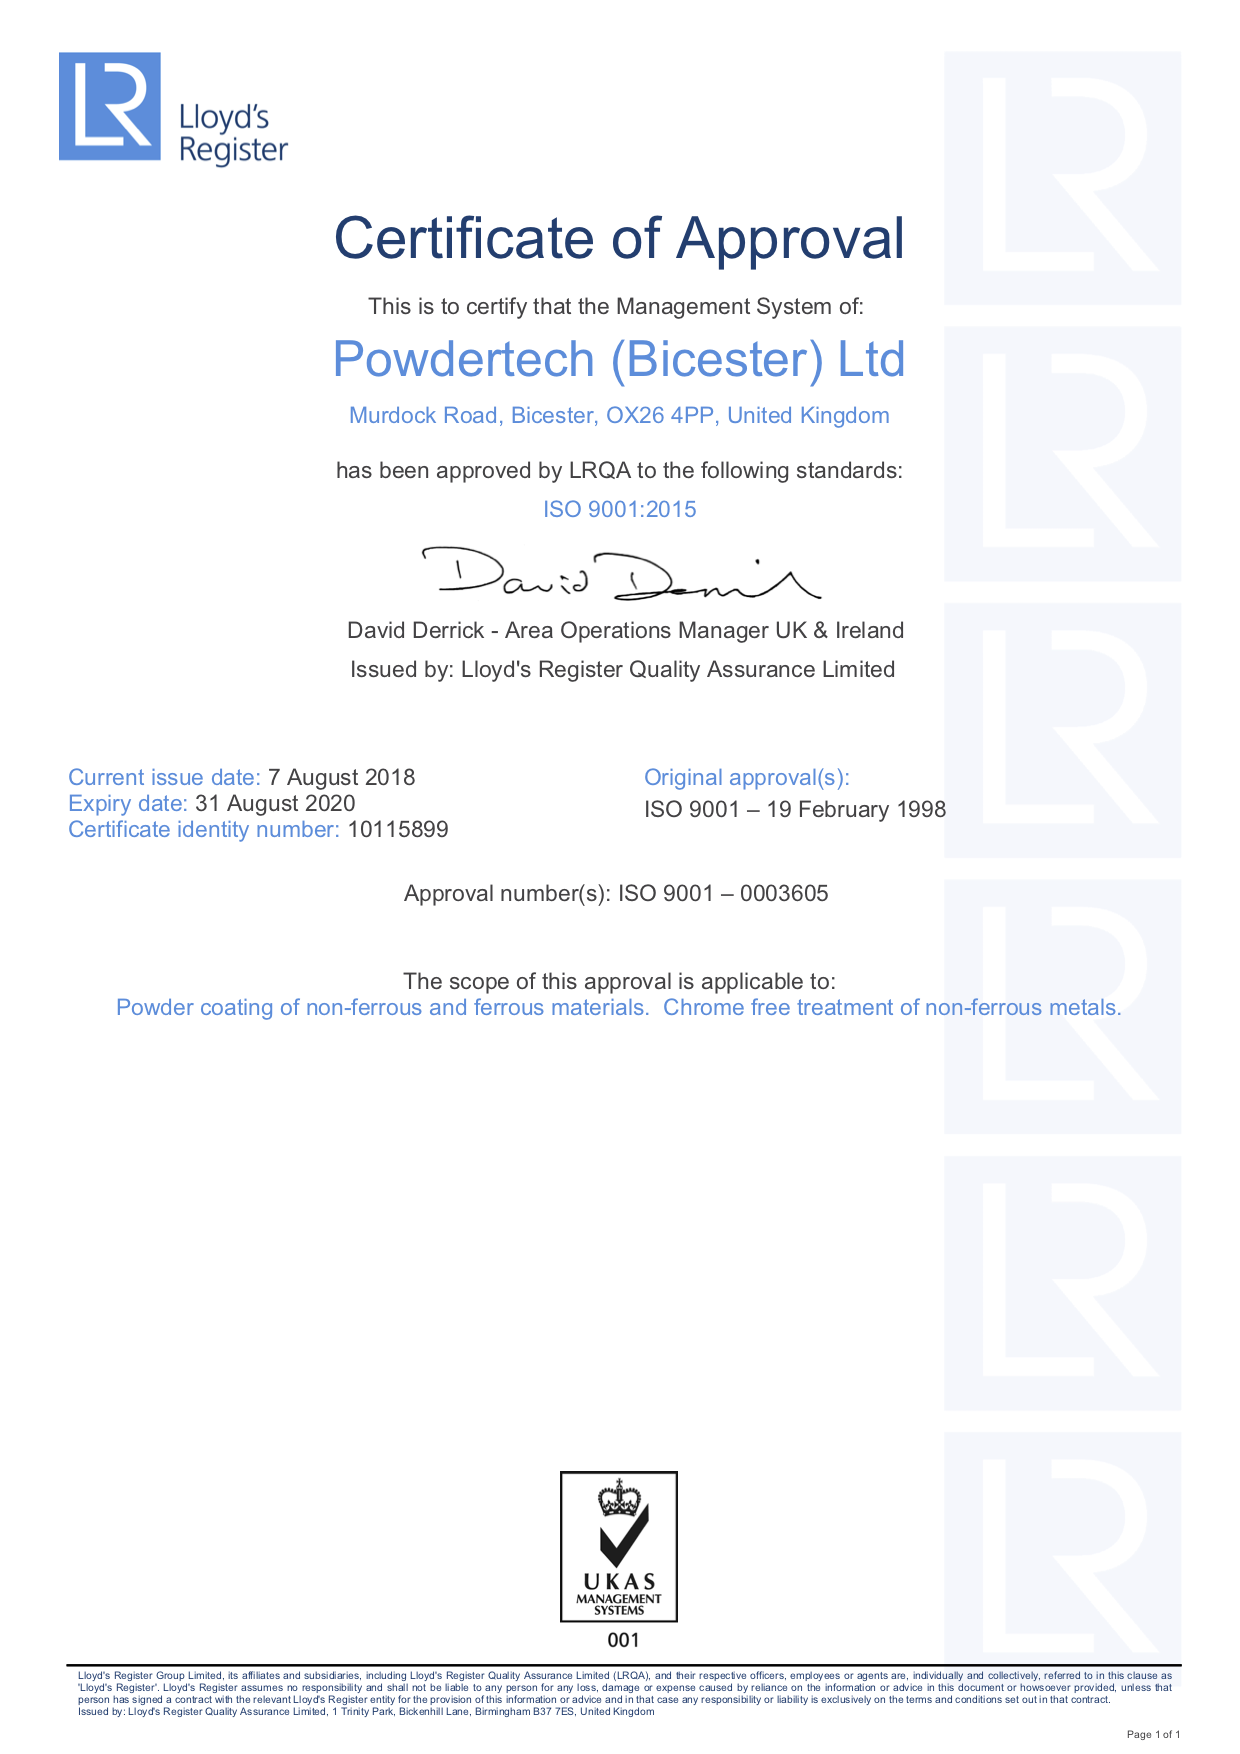 Powdertech (Bicester) Ltd QMS LRQ0959173 expiry Aug 2020 copy.png